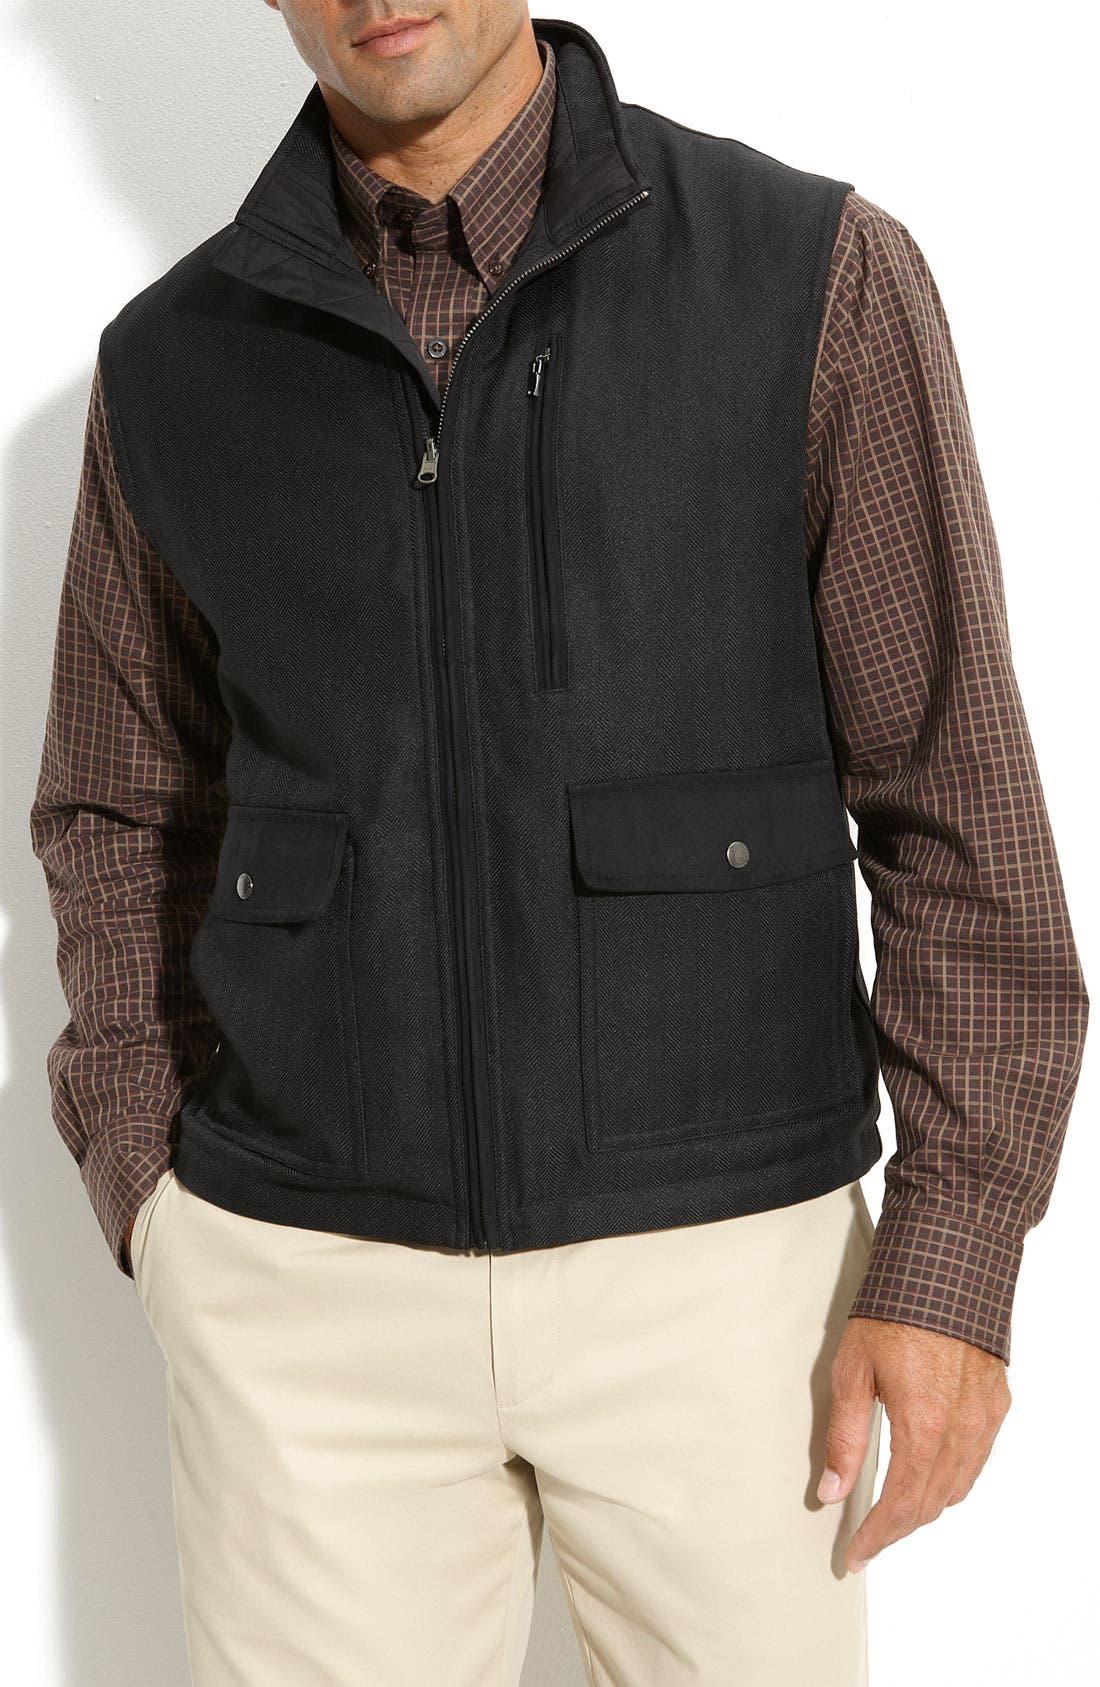 Main Image - Cutter & Buck 'Bearsden' Reversible Vest